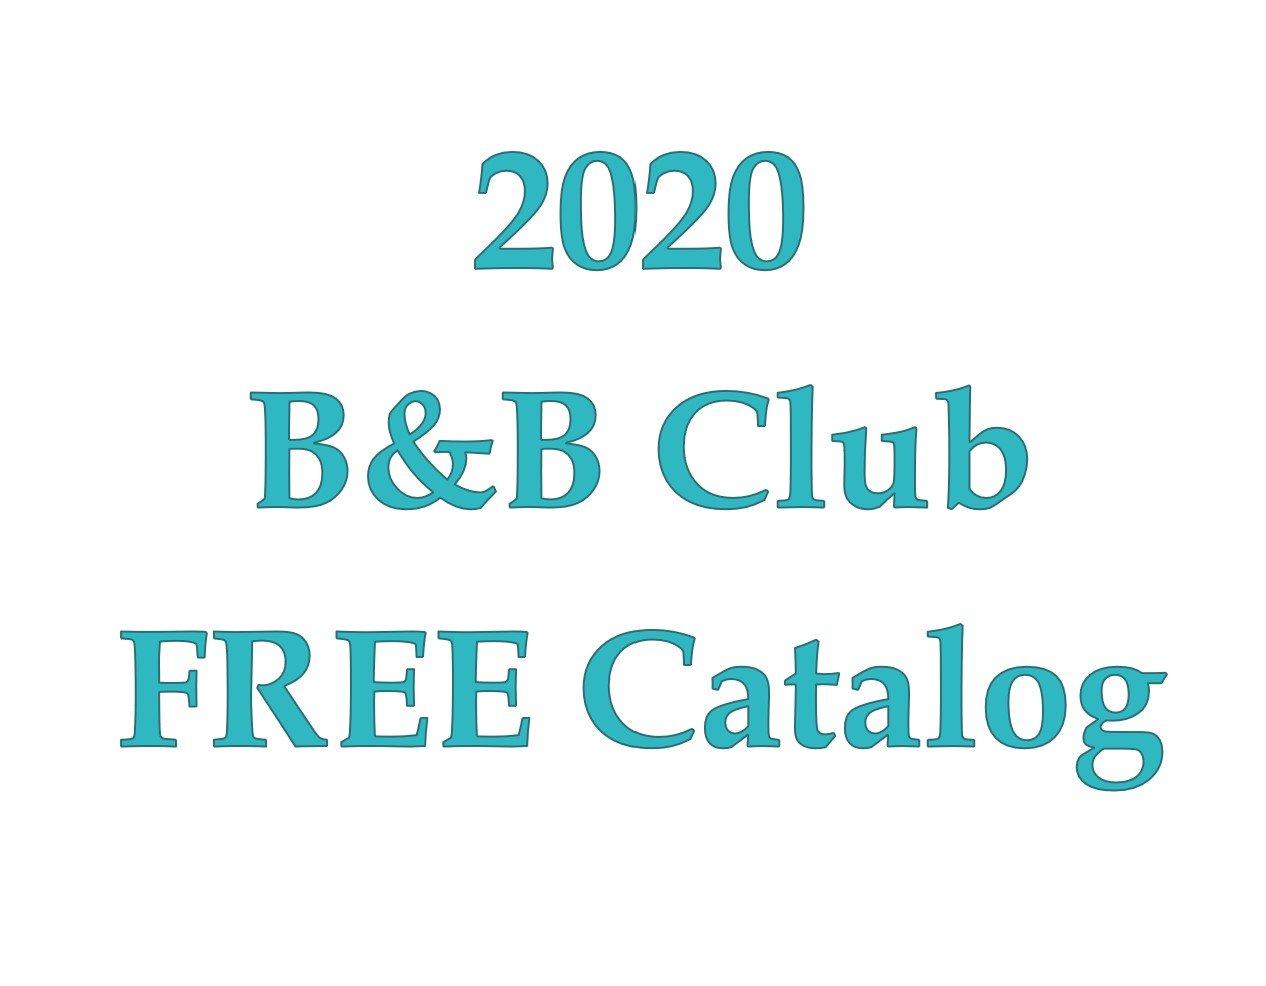 B&B Club Catalog of patterns 2020